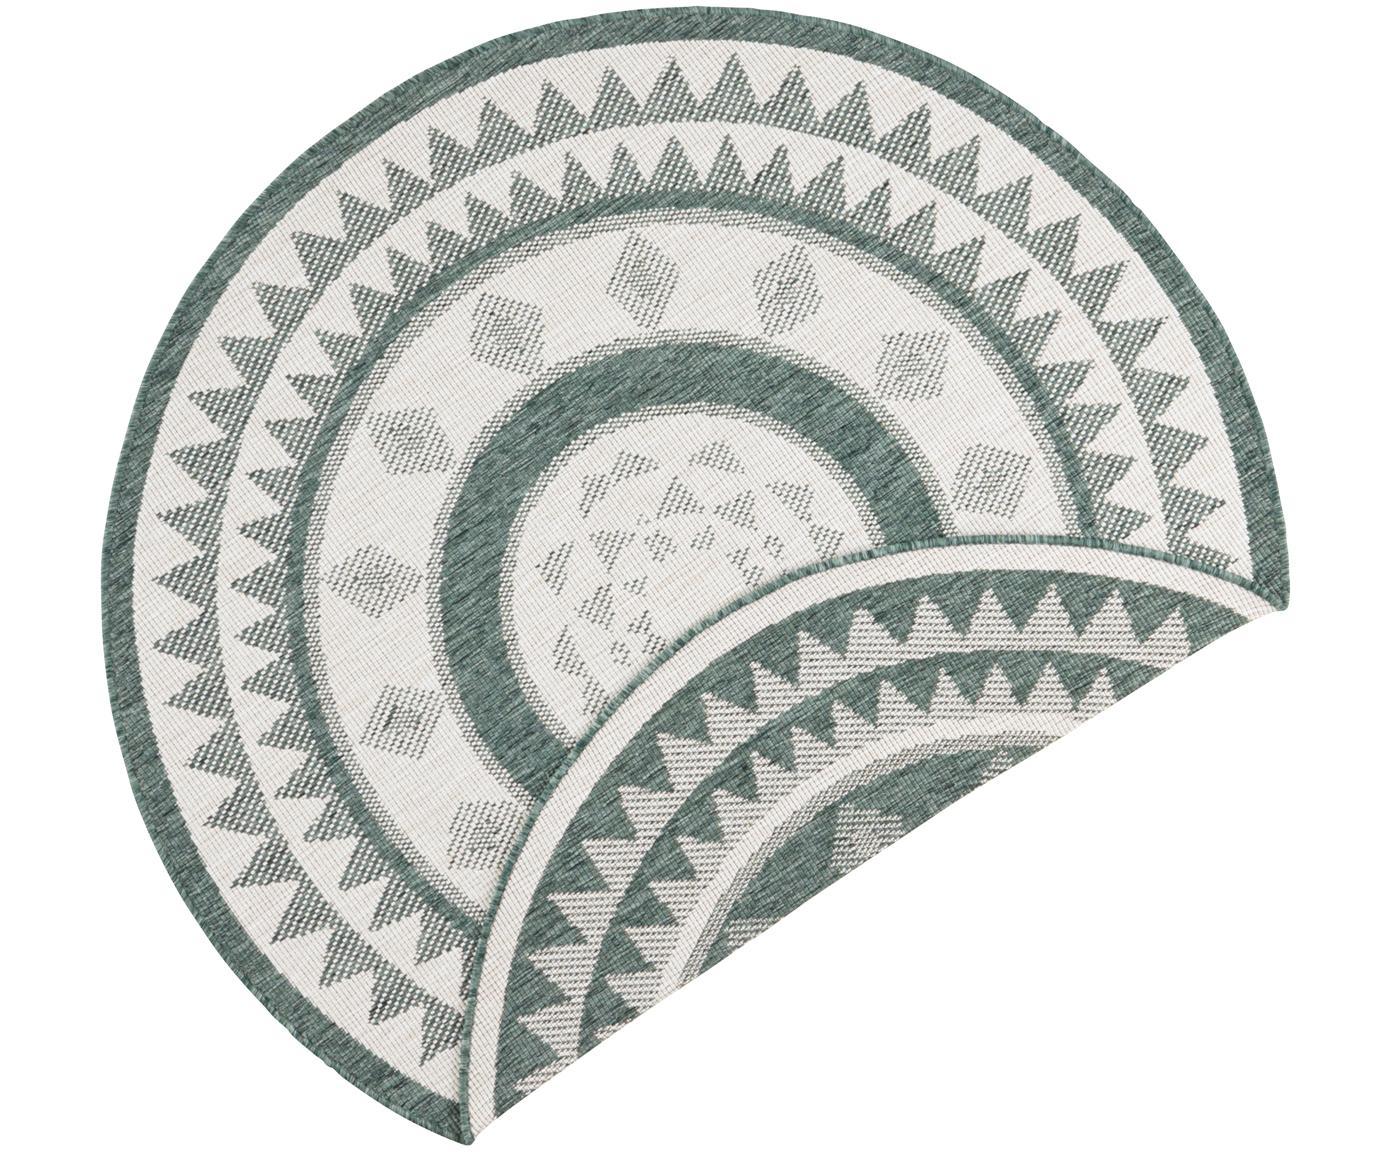 Alfombra redonda reversible de interior/exterior Jamaica, Verde, crema, Ø 140 cm (Tamaño M)